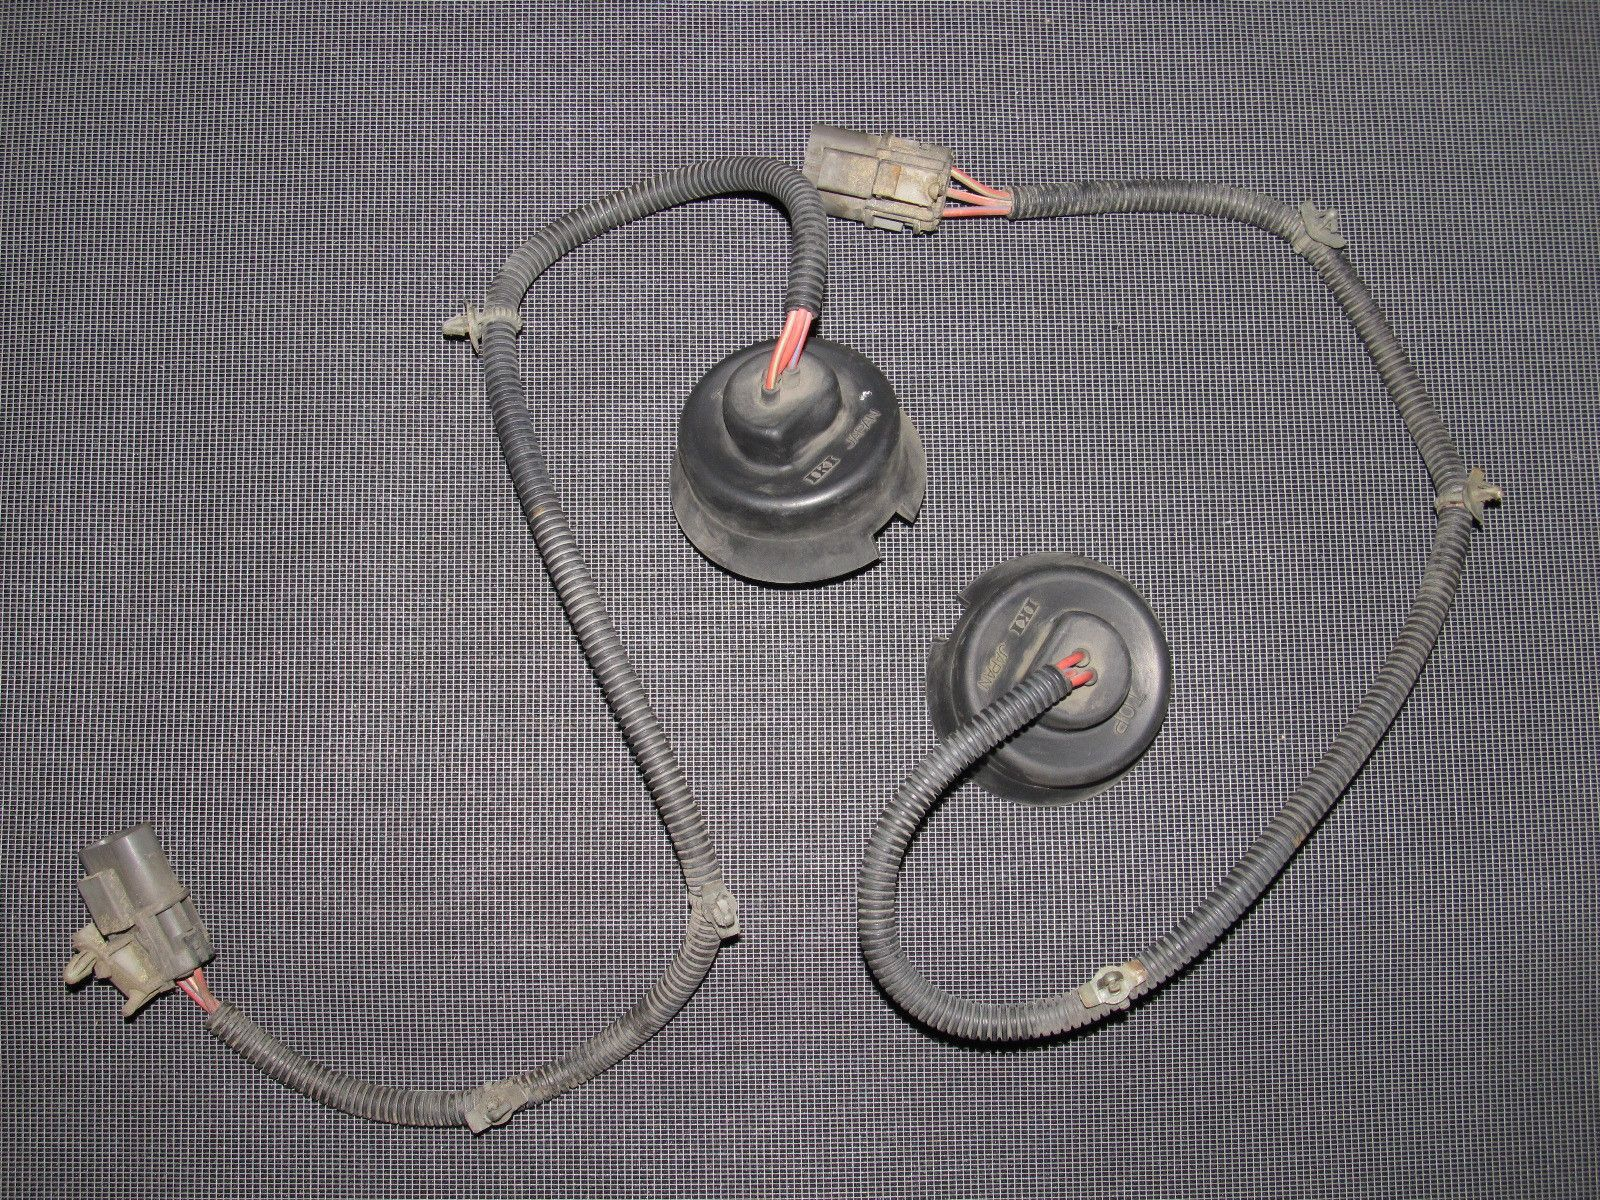 medium resolution of 240sx headlight wiring wiring diagram database 1989 nissan 240sx headlight wiring 240sx headlight wiring